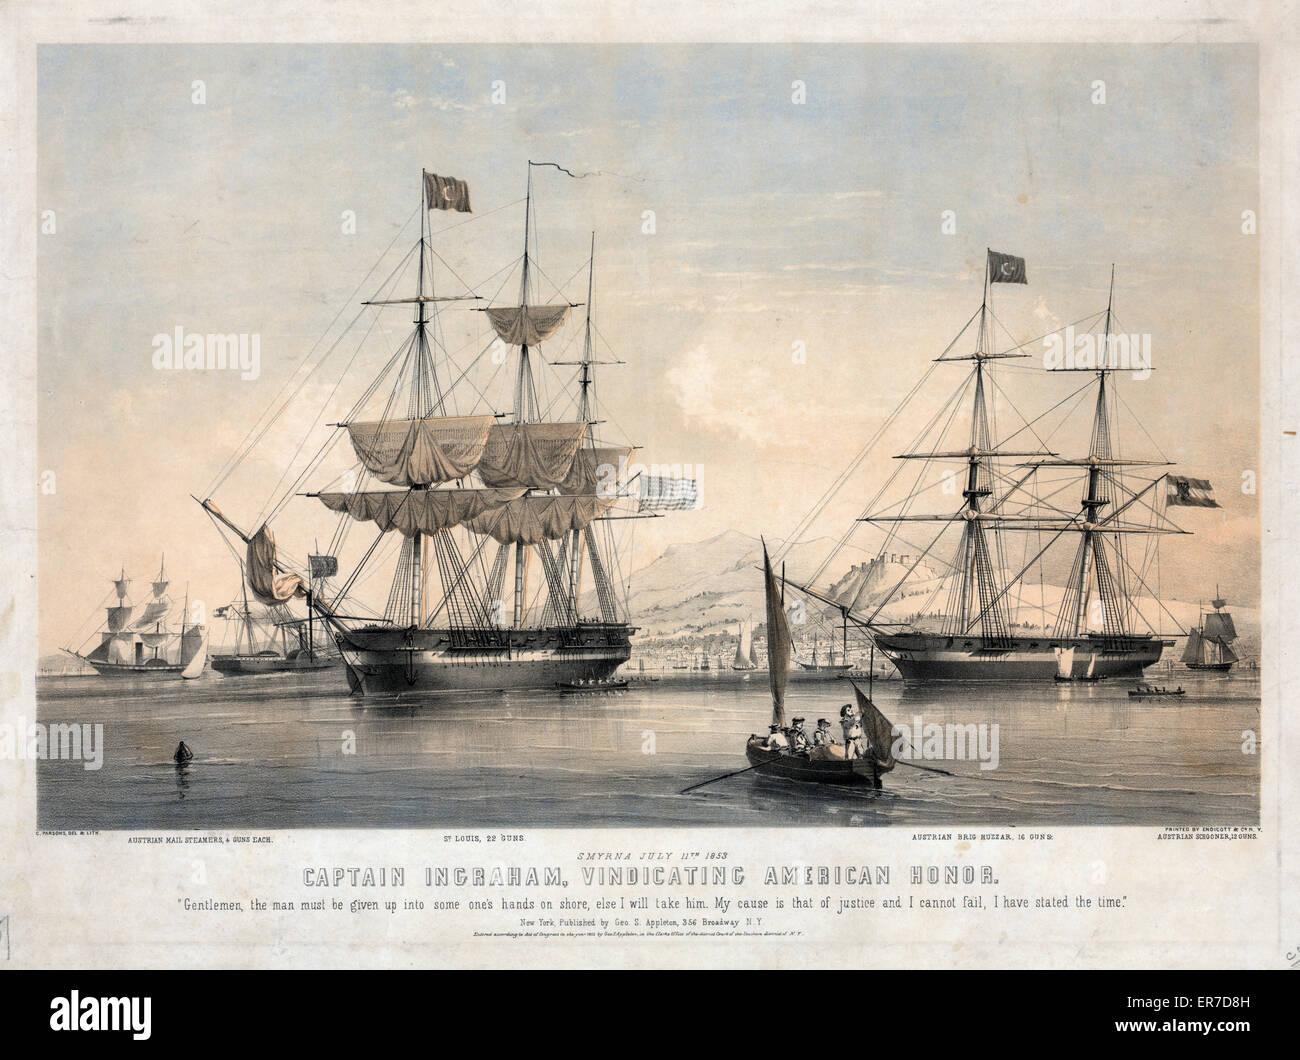 Captain Ingraham, vindicating American honor. - Stock Image